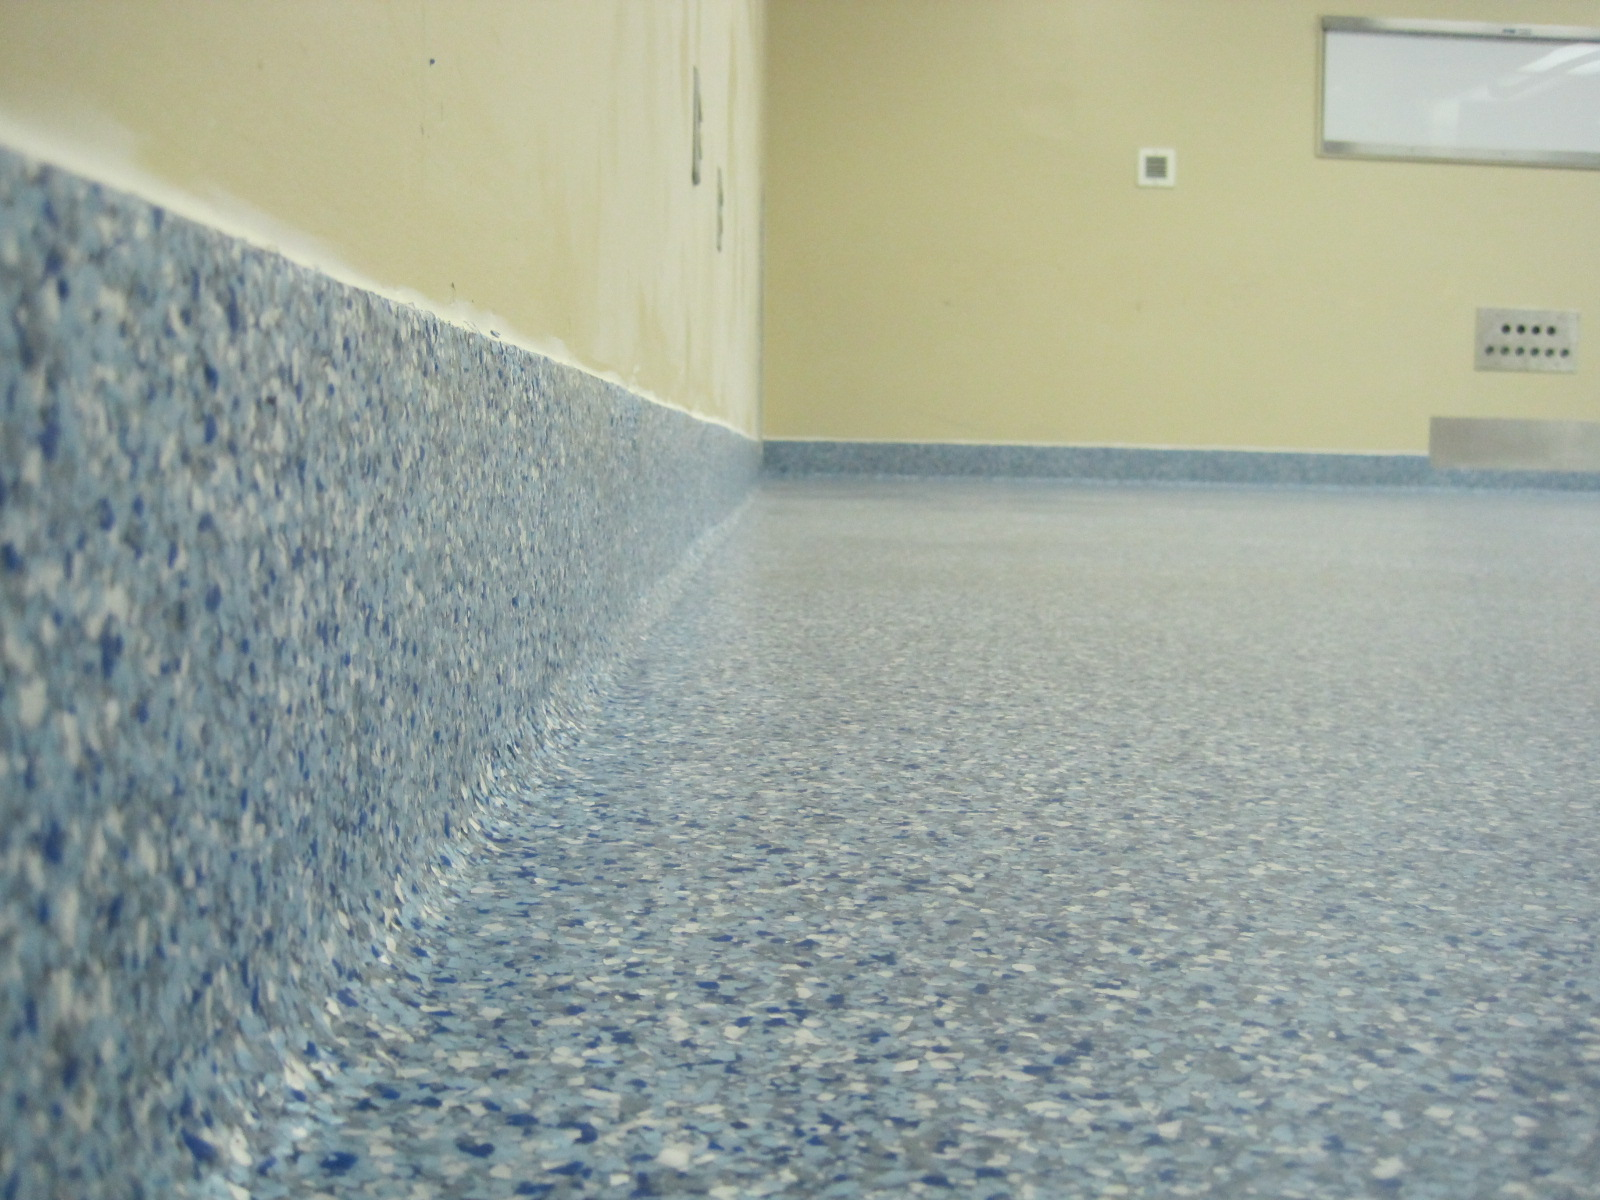 Silikal photo gallery for Flooring america